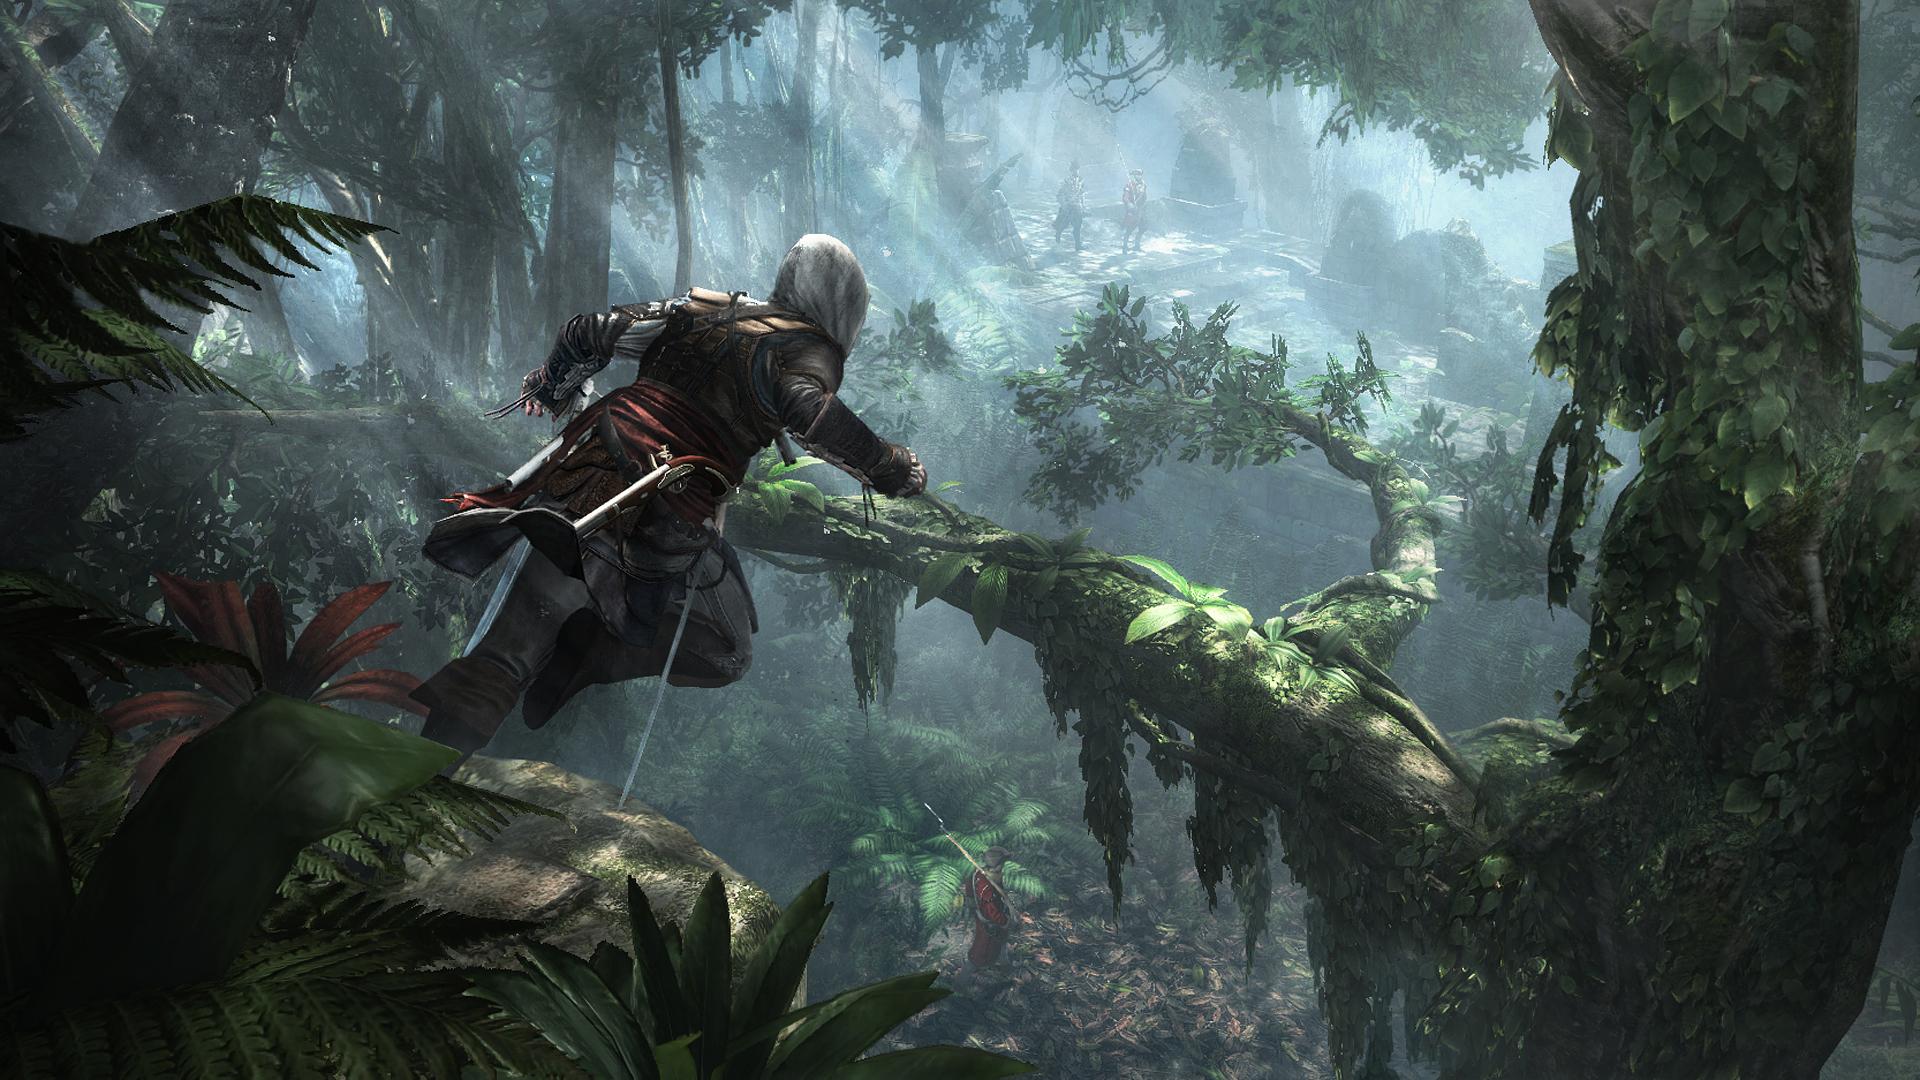 Ubisoft улучшила стелс в Assassin's Creed 4: Black Flag